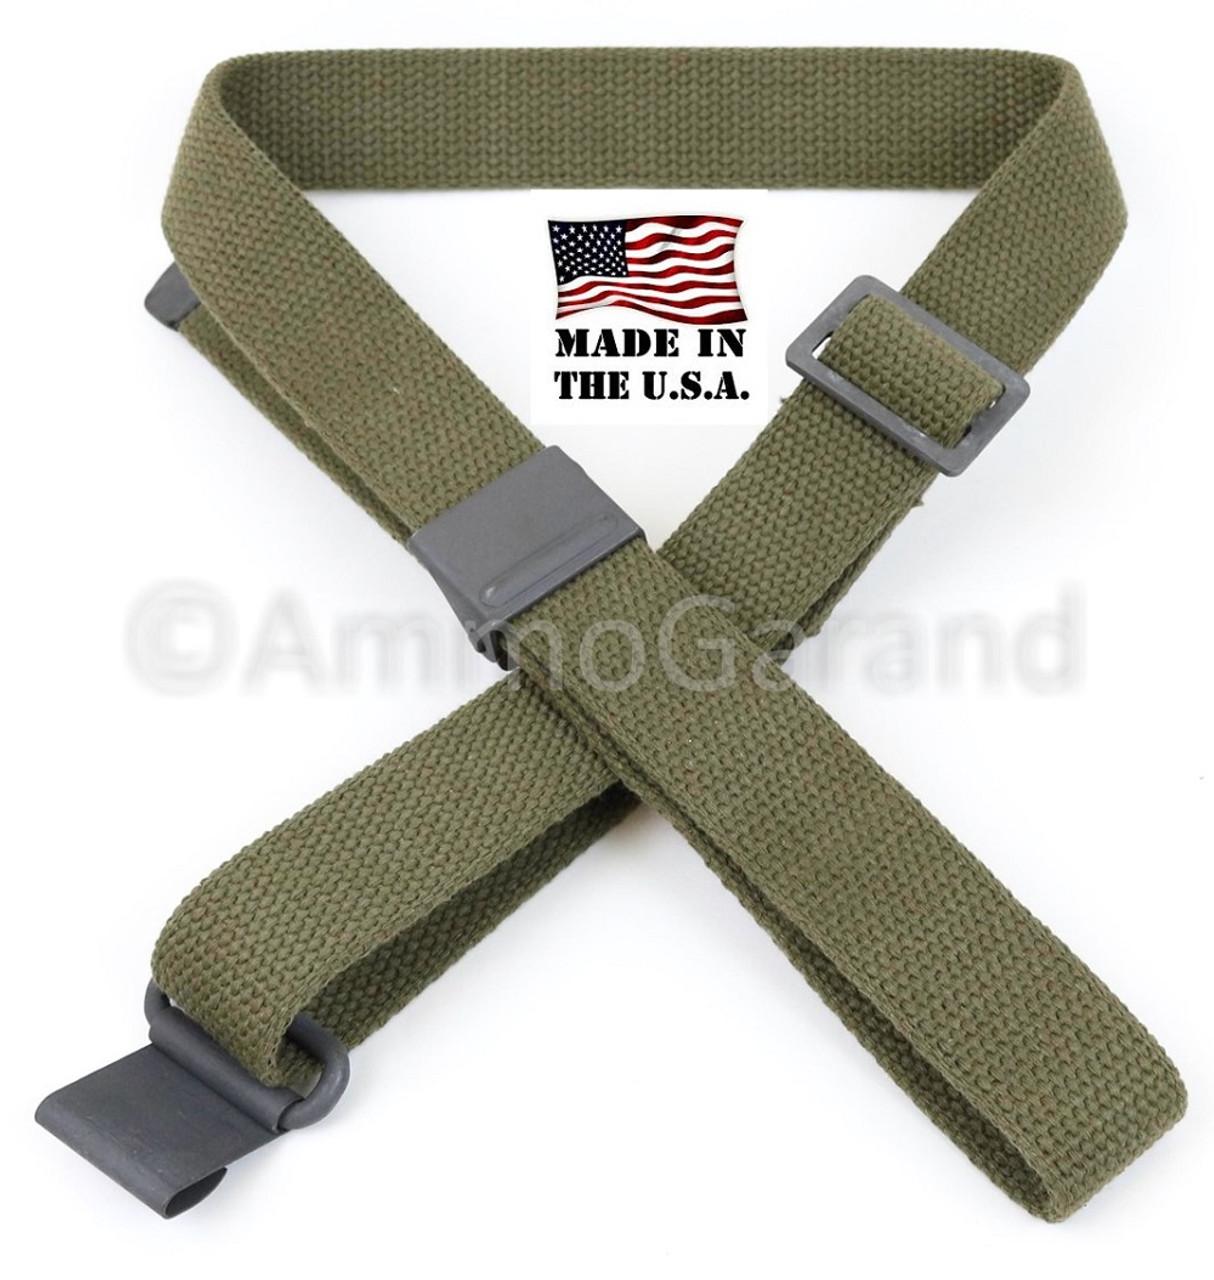 AmmoGarand OD Cotton Web Sling for M1 Garand